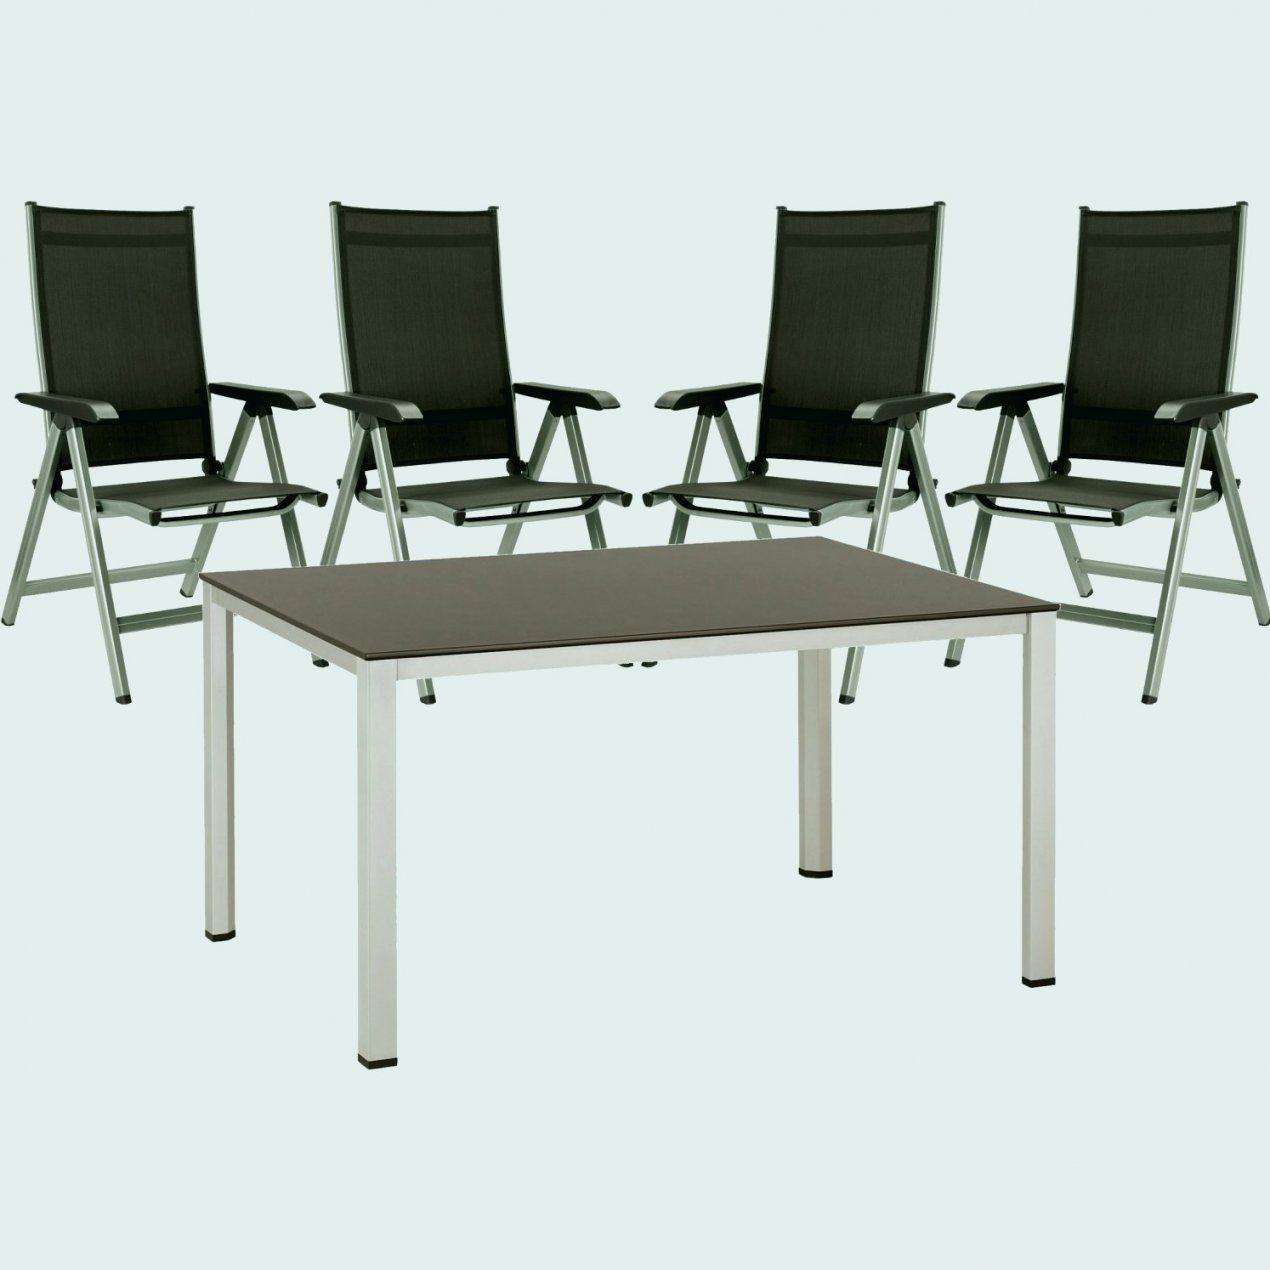 Kettler Basic Plus Tisch Frisch Kettler Basic Plus Stapelsessel von Kettler Stuhl Basic Plus Bild